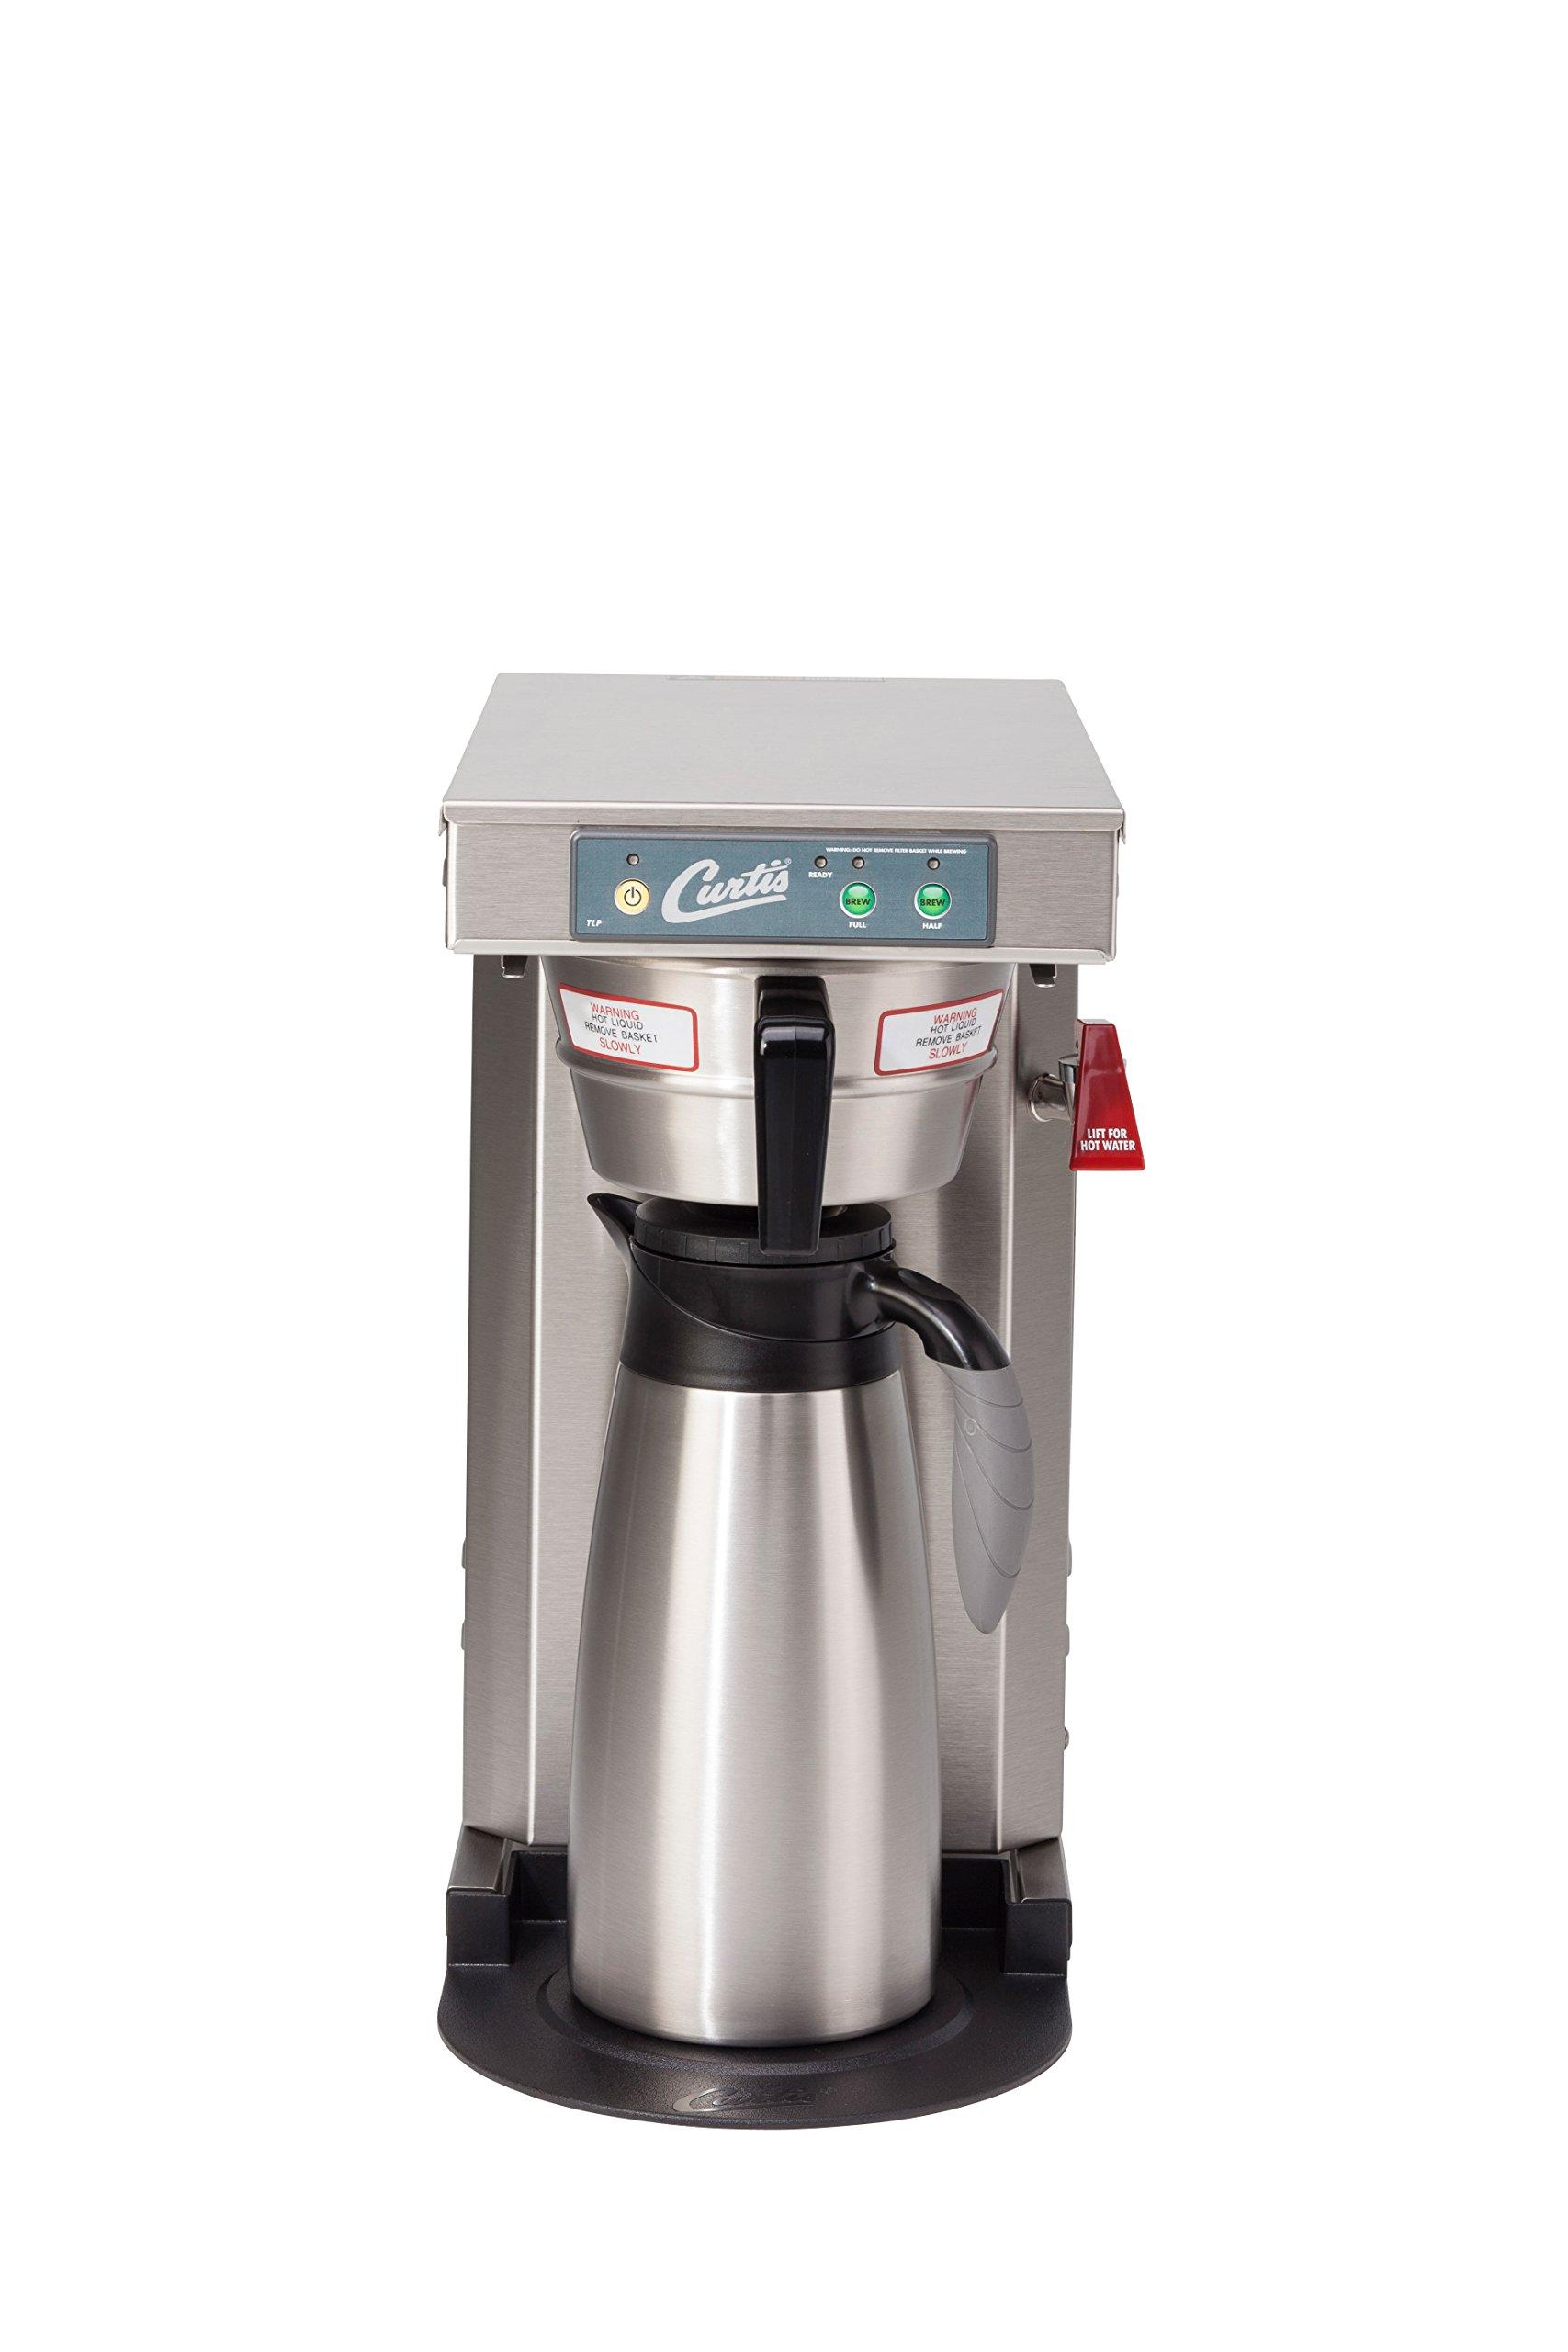 Wilbur Curtis G3 Low Profile Airpot Brewer 2.5L Airpot/Pourpot Single Low Profile Coffee Brewer Stainless Steel Finish - Commercial Airpot Coffee Brewer  - TLP12A (Each)